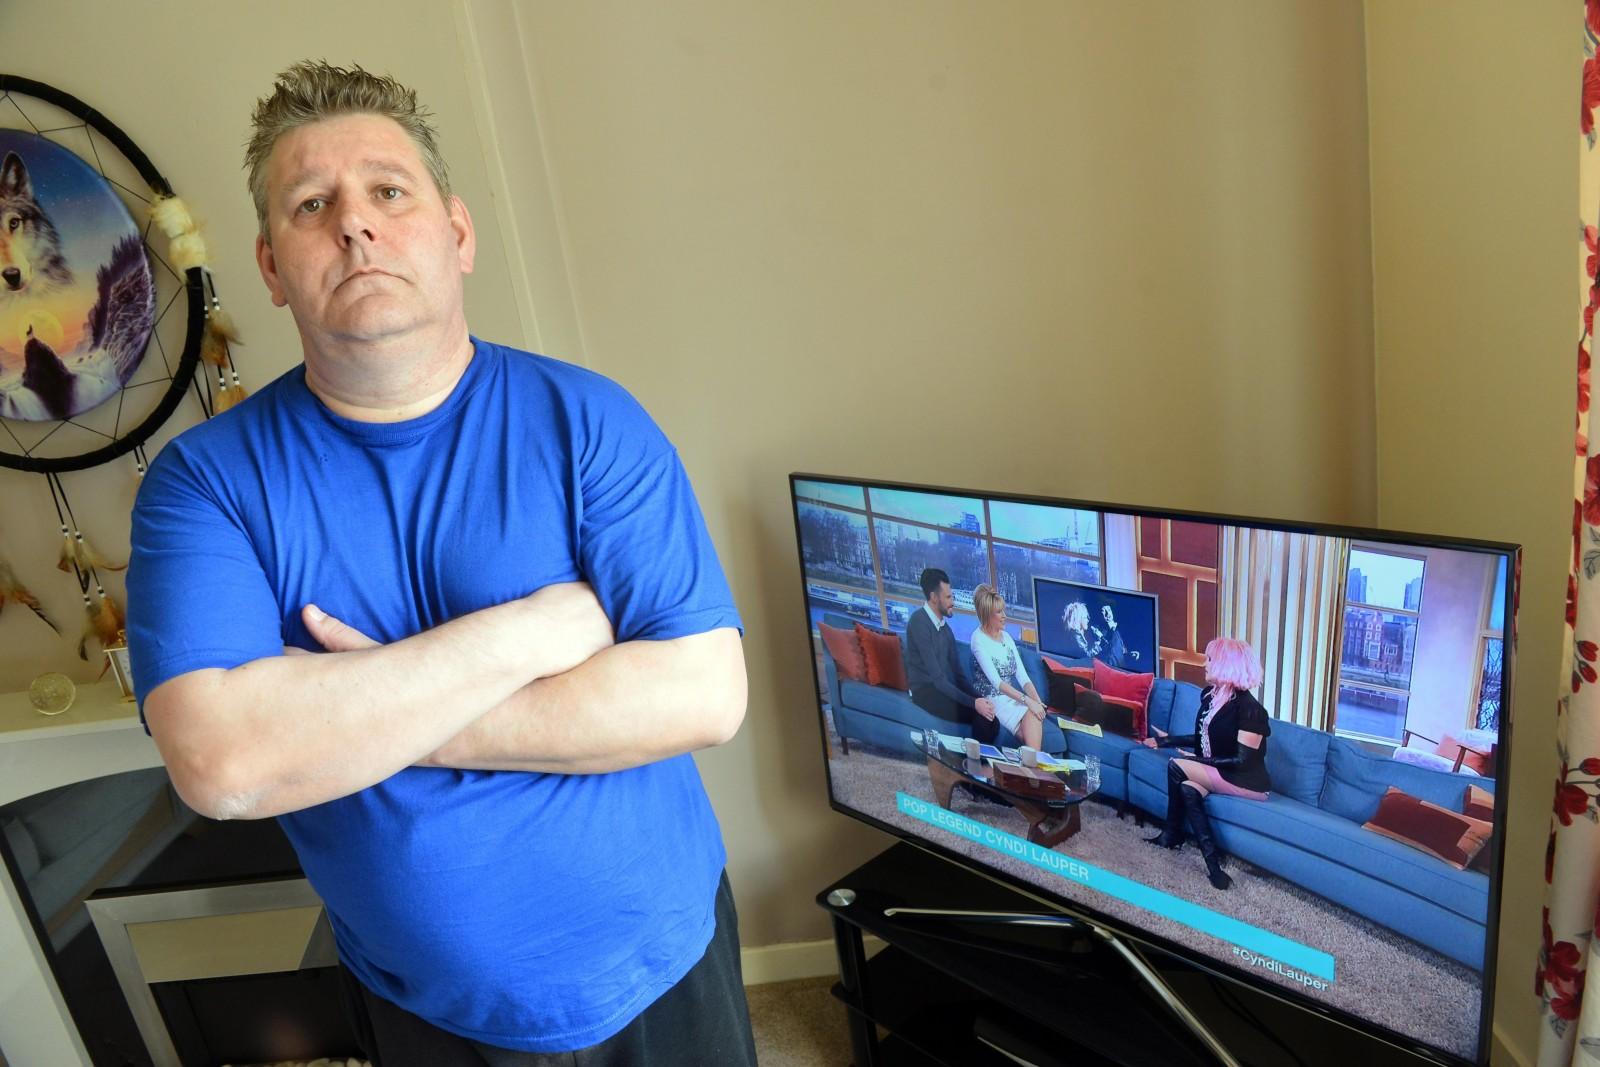 The reason Panasonic wont fix this couple's TV seems mad